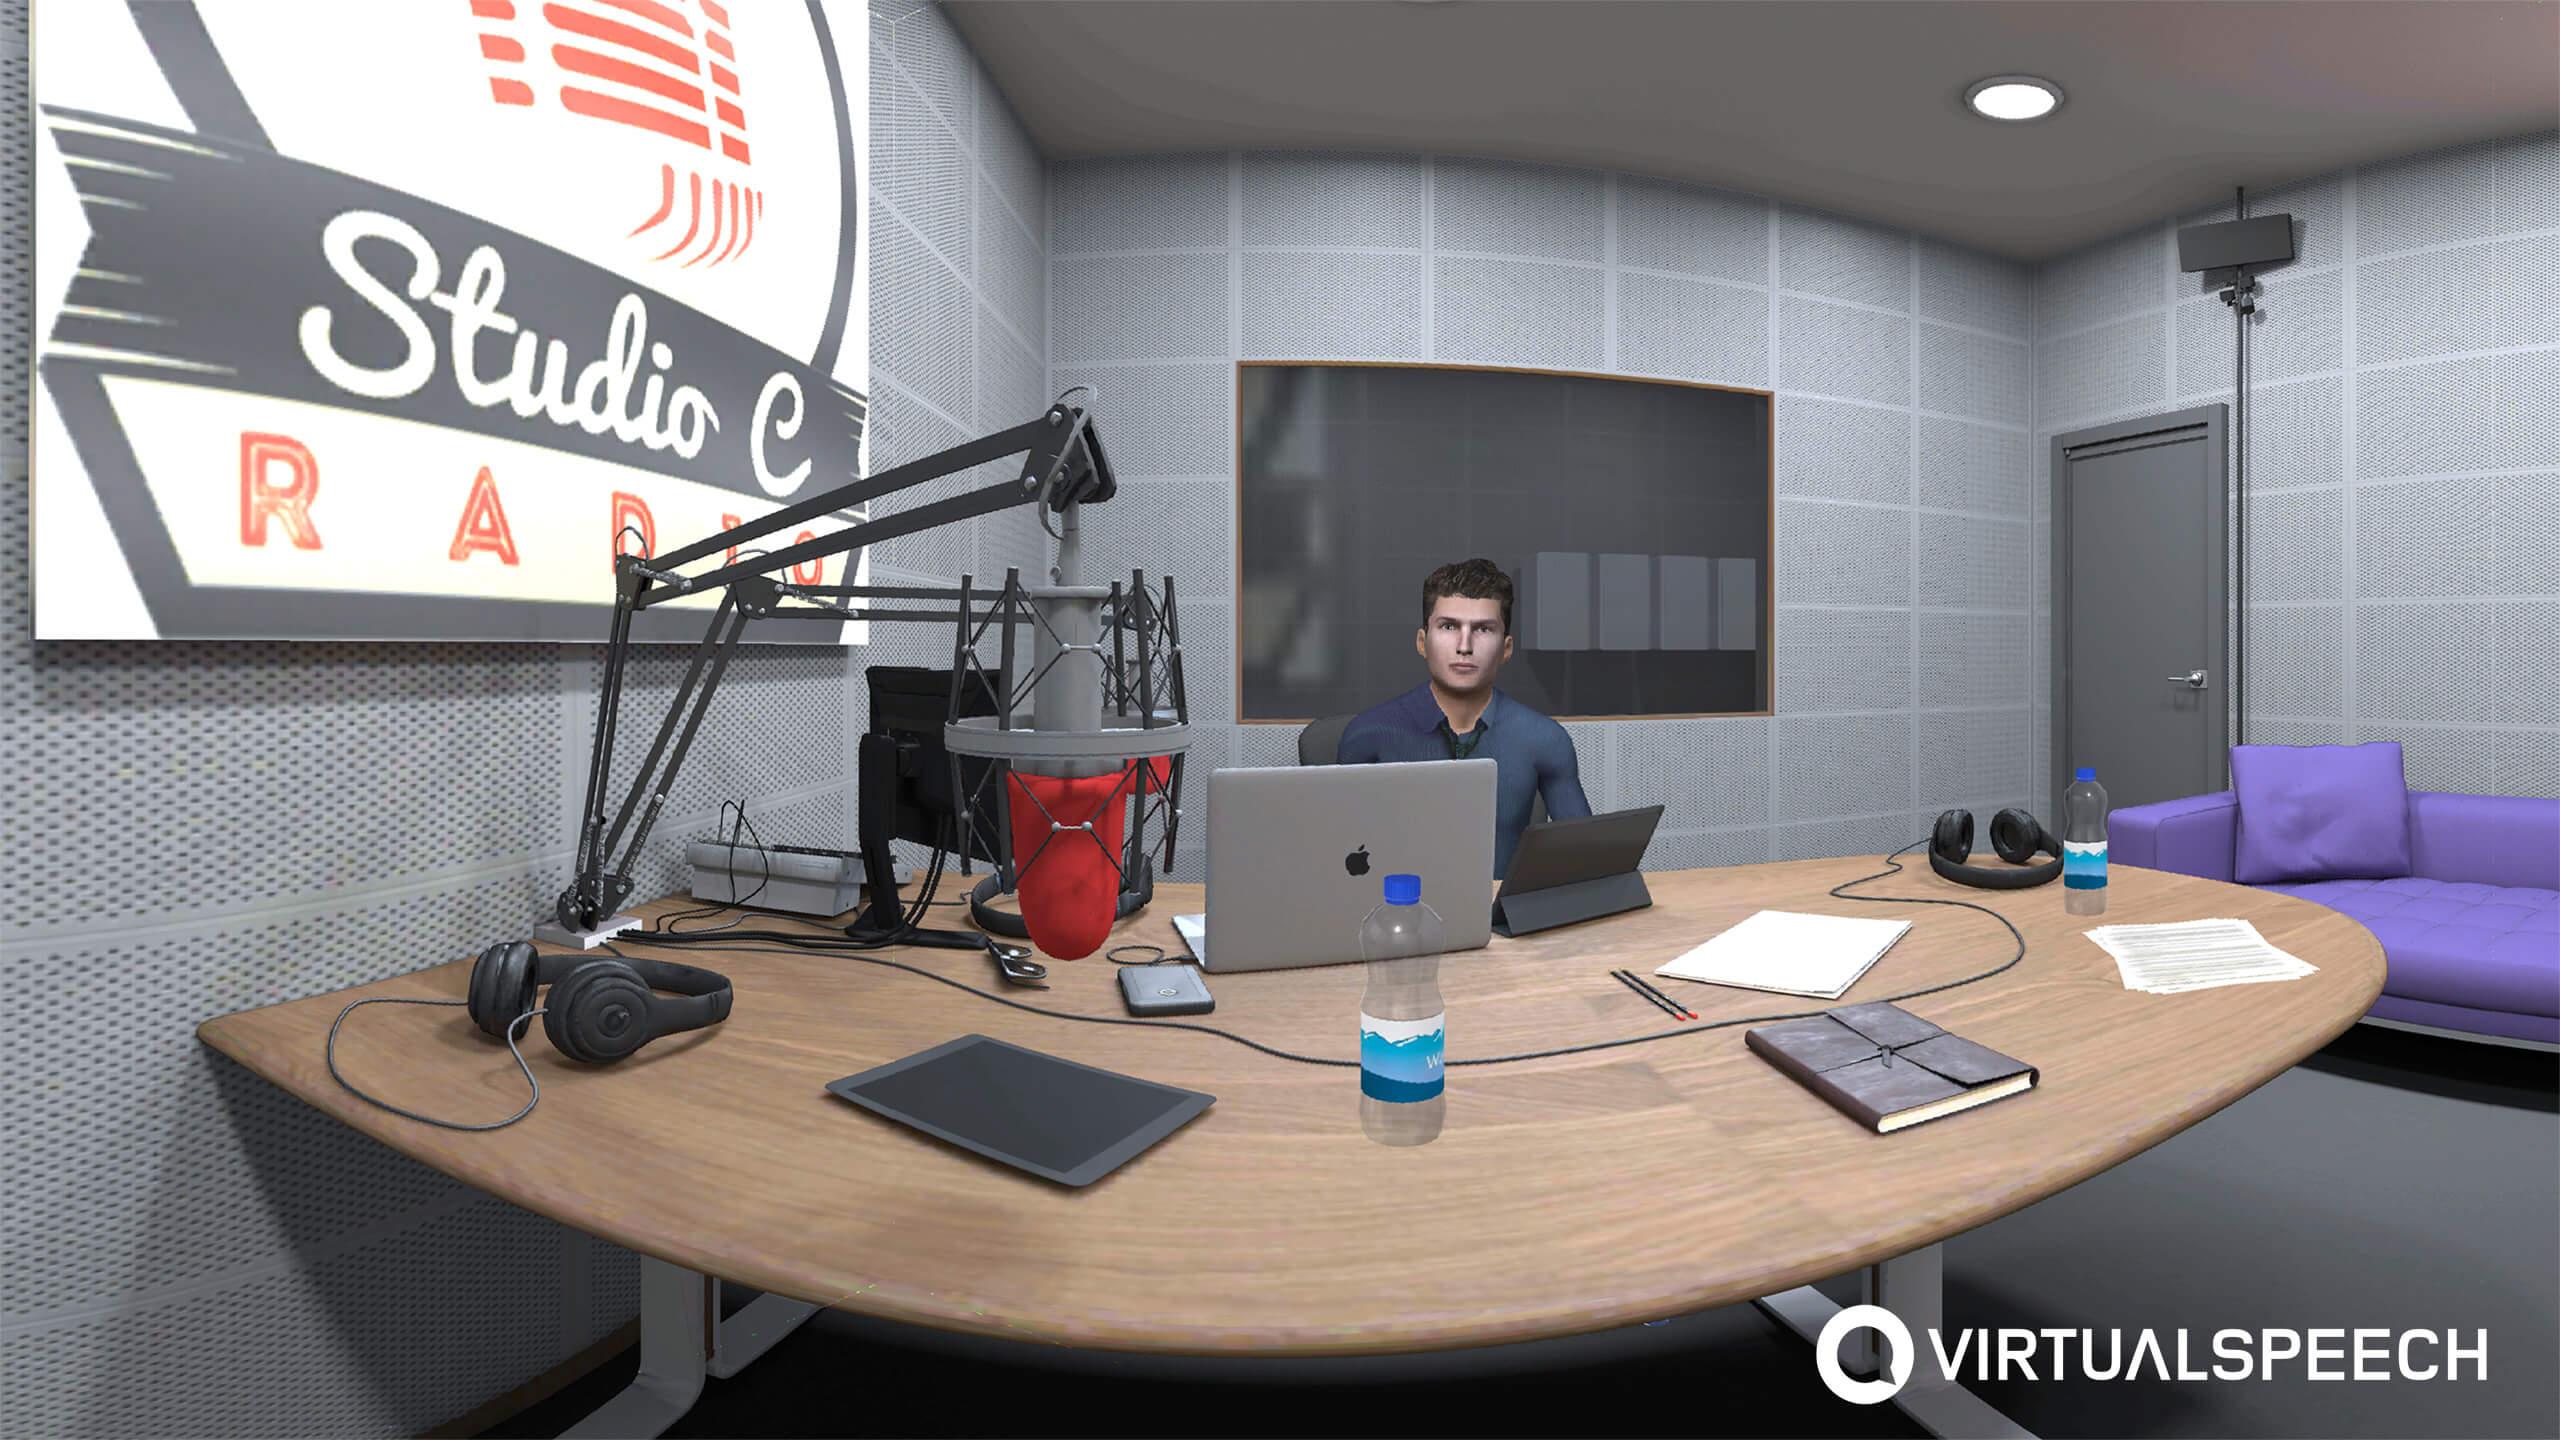 VR Media training - radio station setting